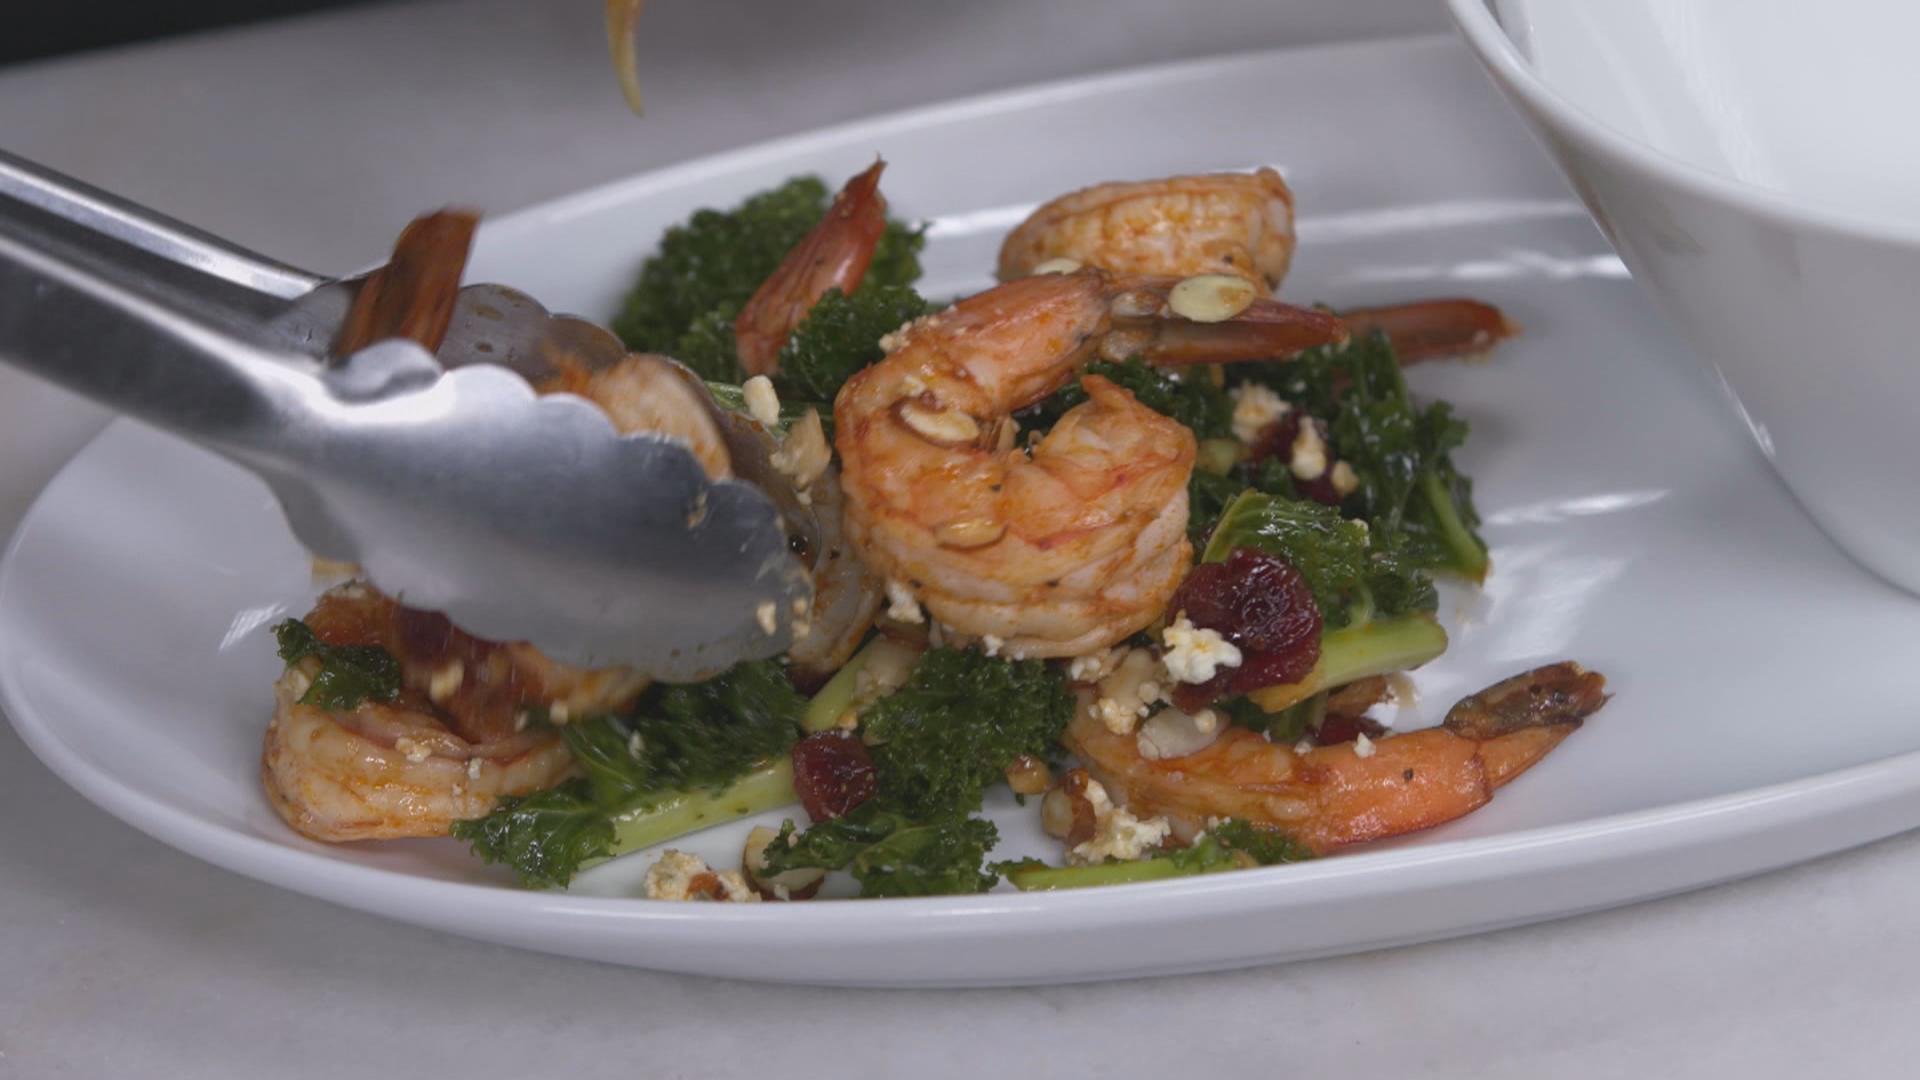 Kale and Shrimp Salad with Warm Cranberry Sauce New Soul Kitchen Remix 104 2